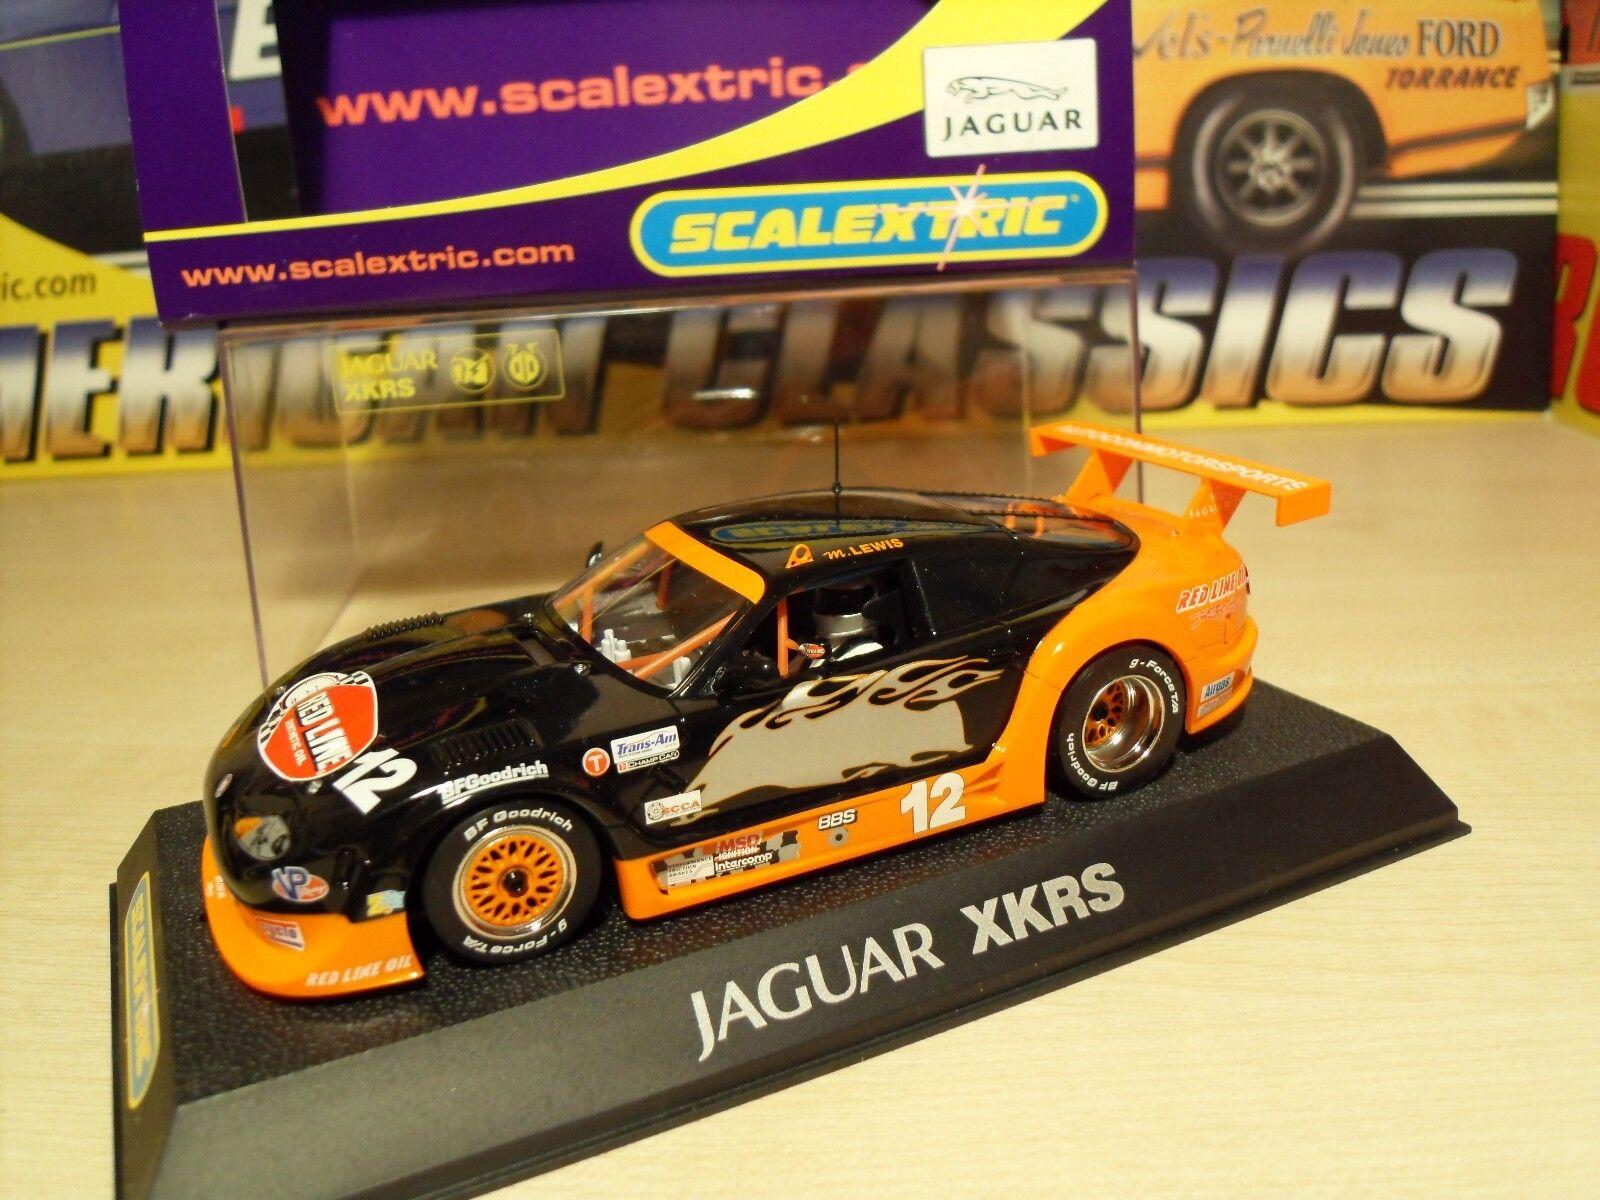 Scalextric C2785 Jaguar XKRS - Brand New in Box.